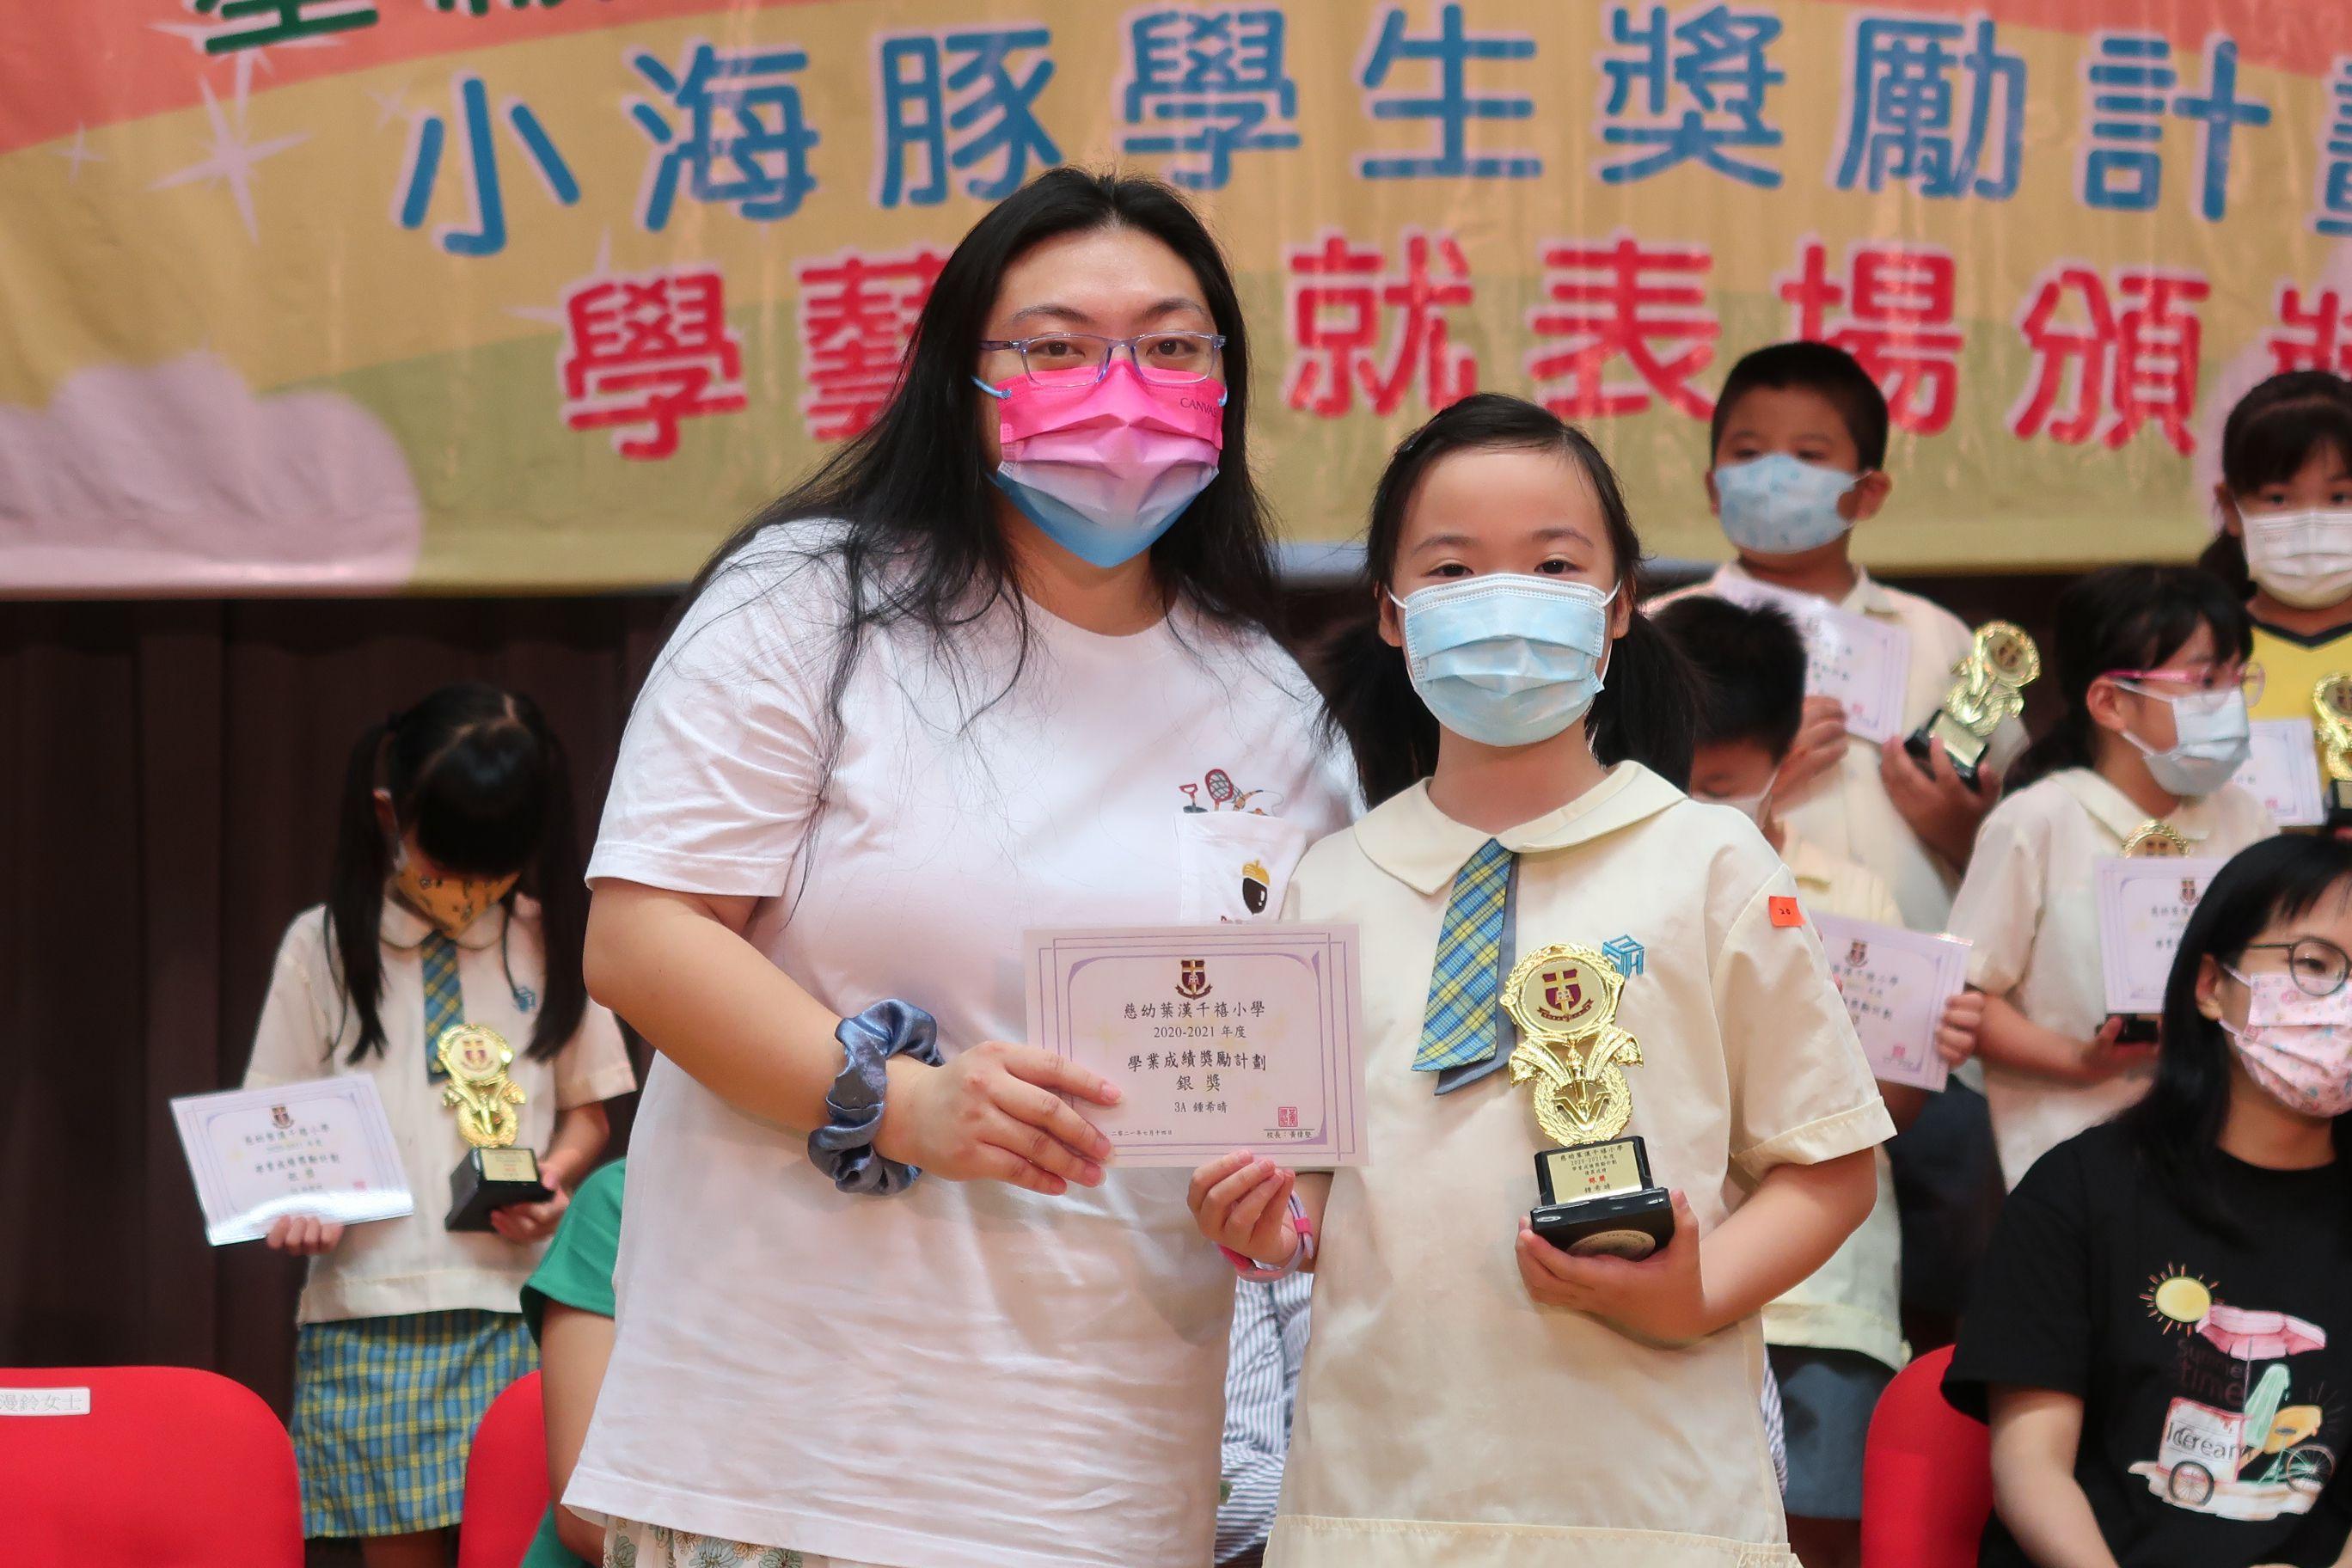 https://syh.edu.hk/sites/default/files/img_5587.jpg